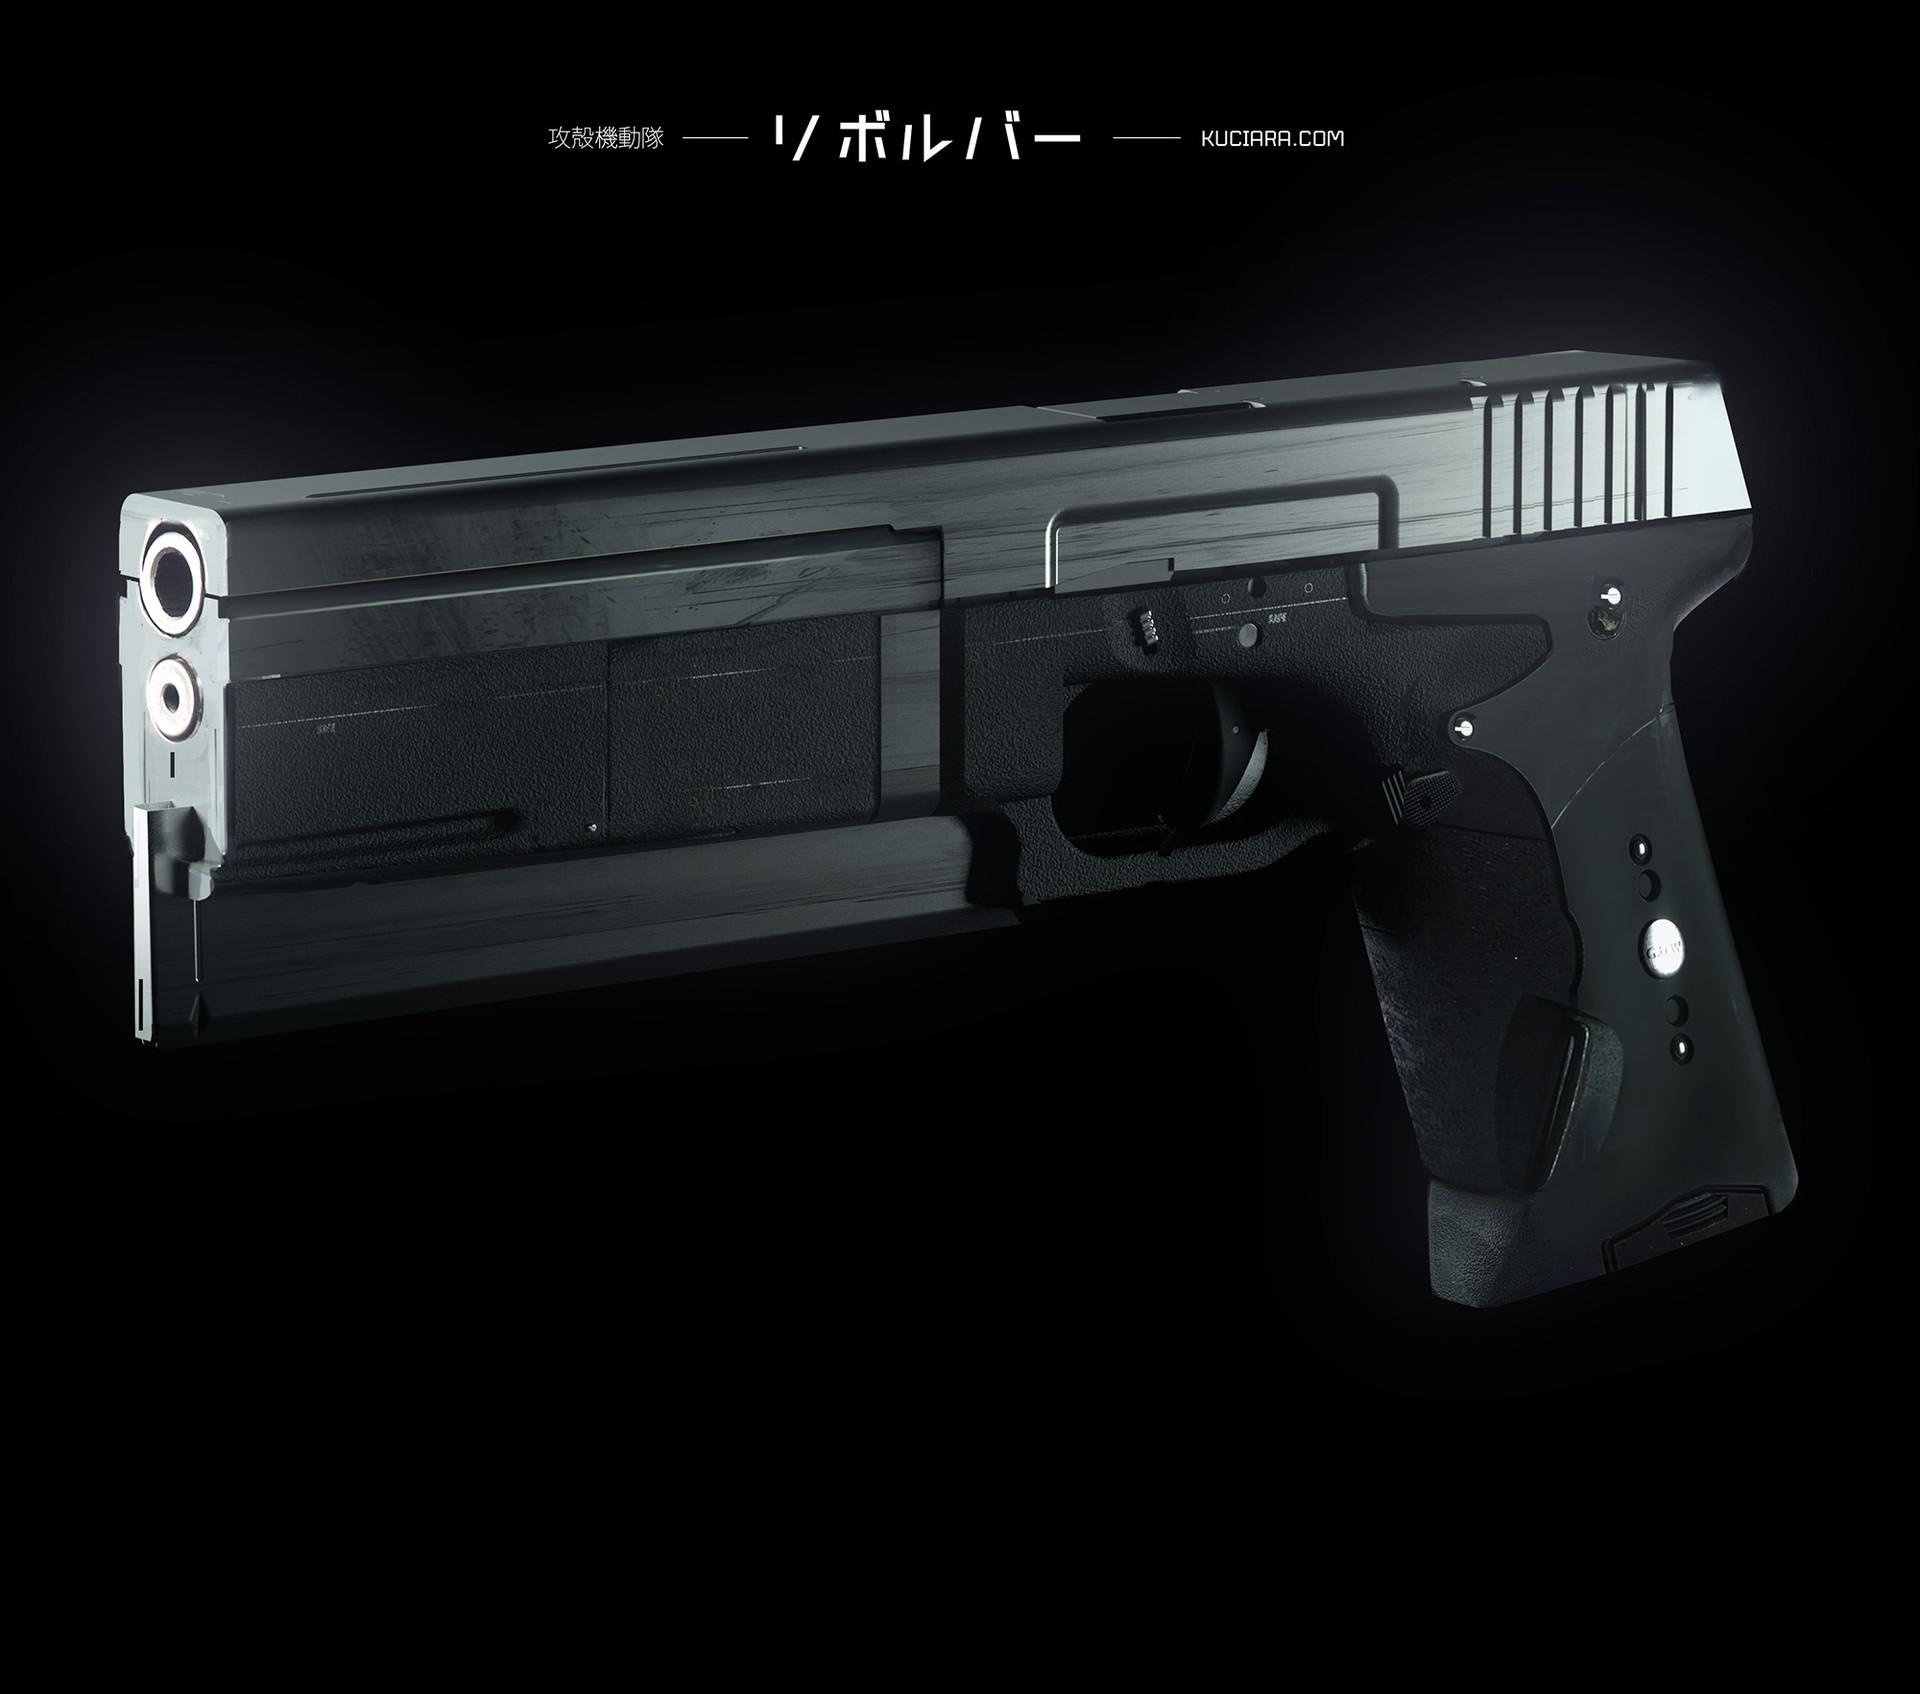 maciej-kuciara-092915-wpn-batou-pistol-m